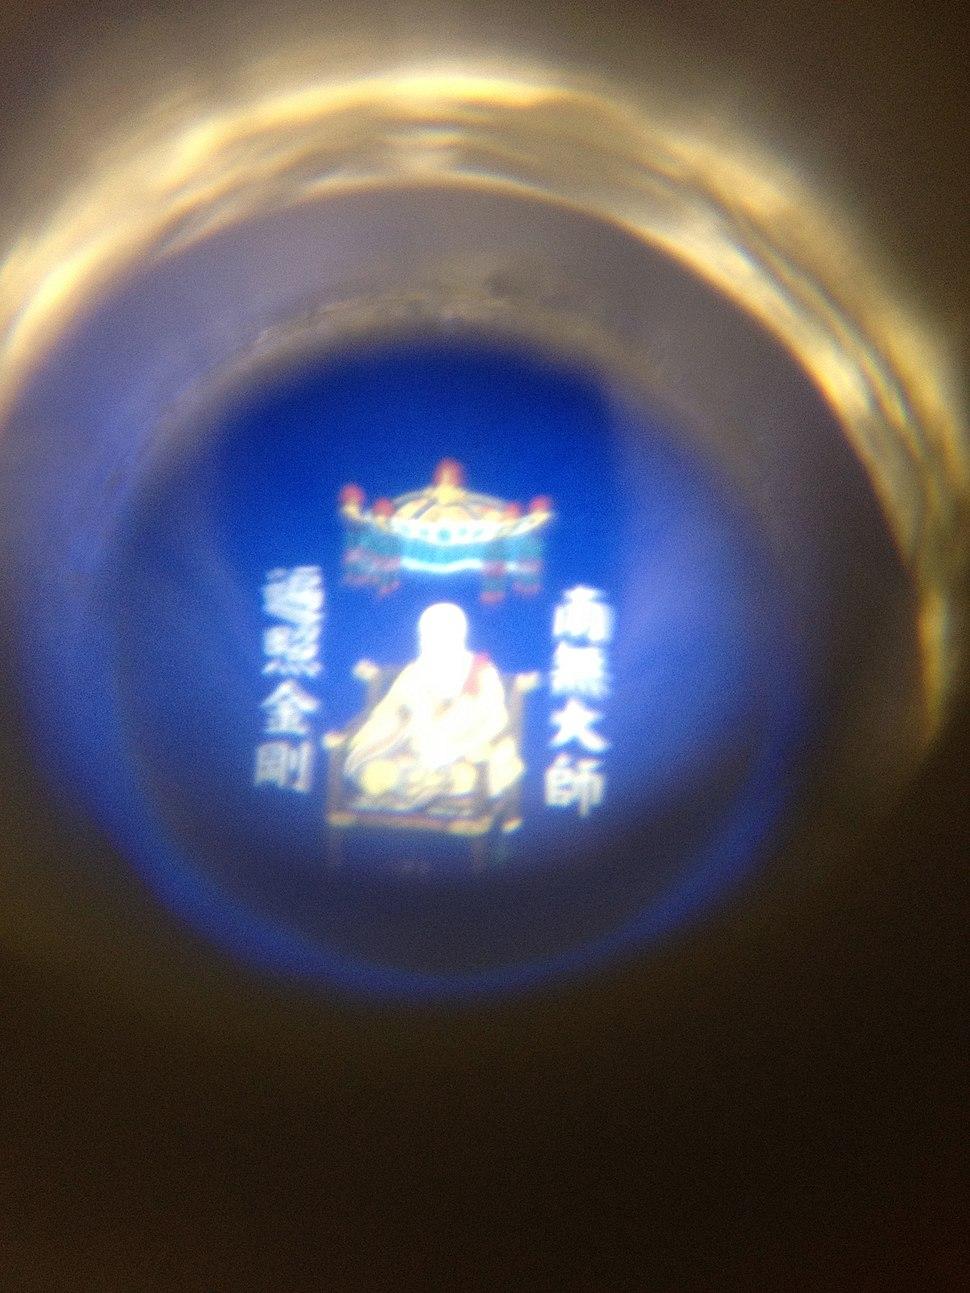 Shingon Buddhist prayer beads, inside